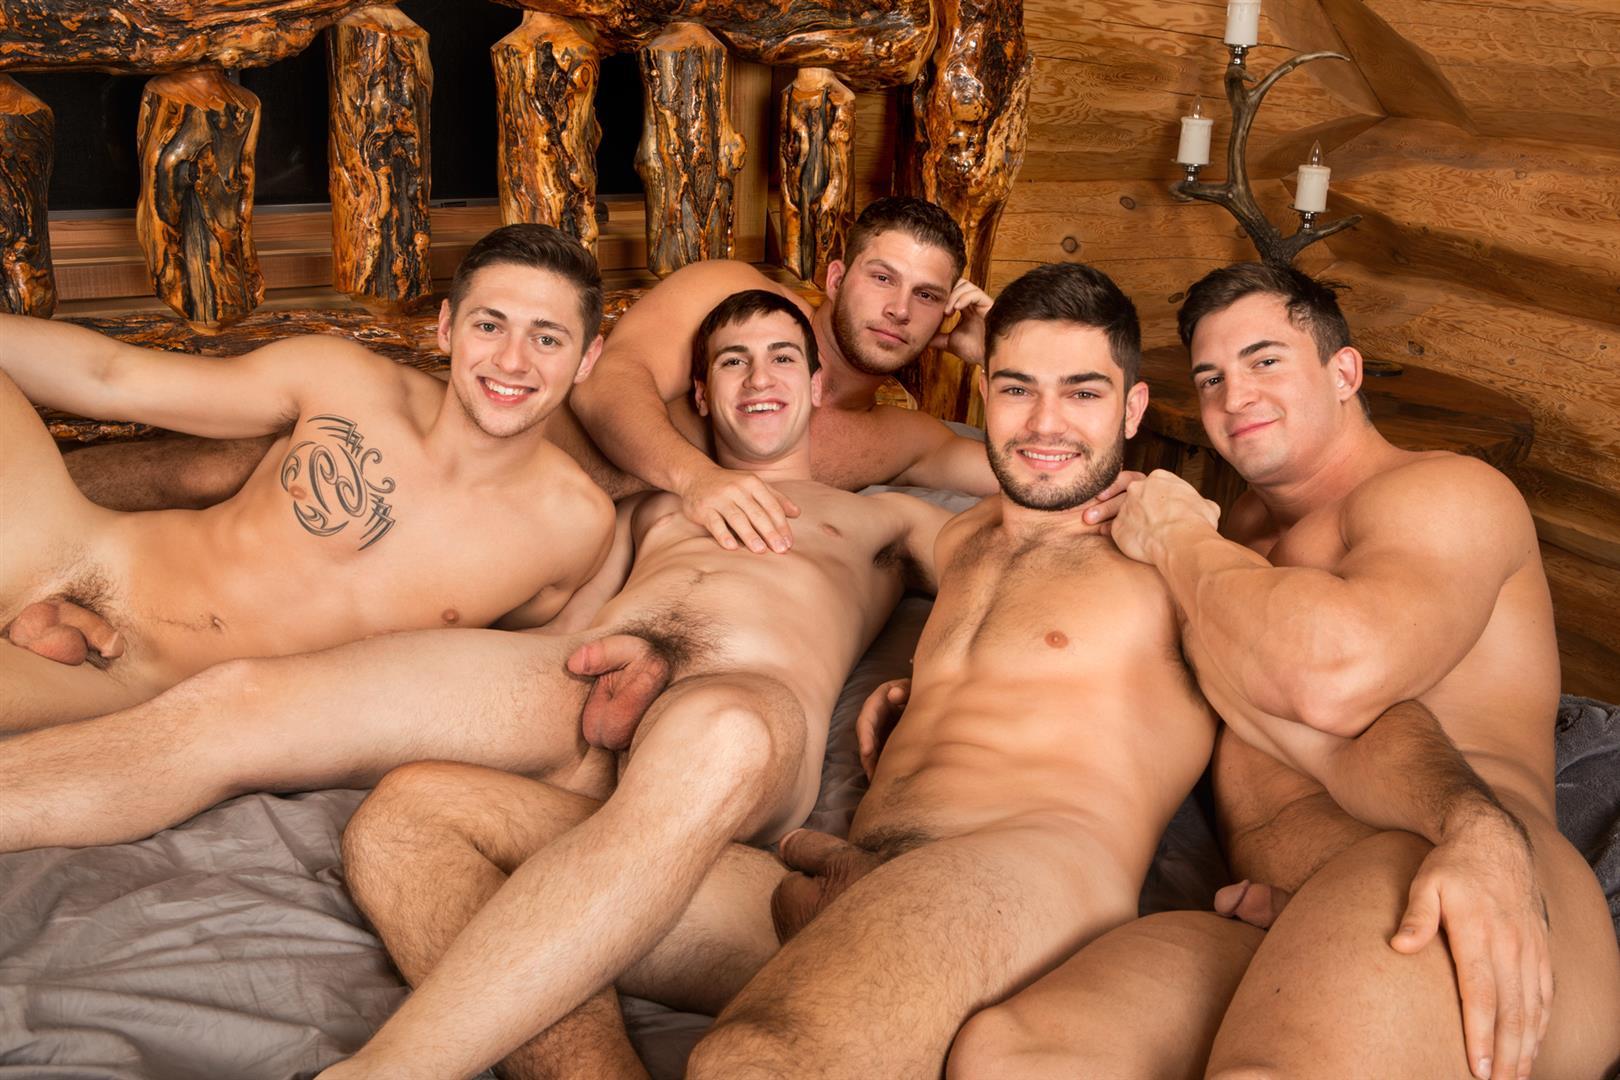 Sean-Cody-Winter-Getaway-Day-1-Big-Dick-Hunks-Fucking-Bareback-Amateur-Gay-Porn-08 Sean Cody Takes The Boys On A 8-Day Bareback Winter Getaway